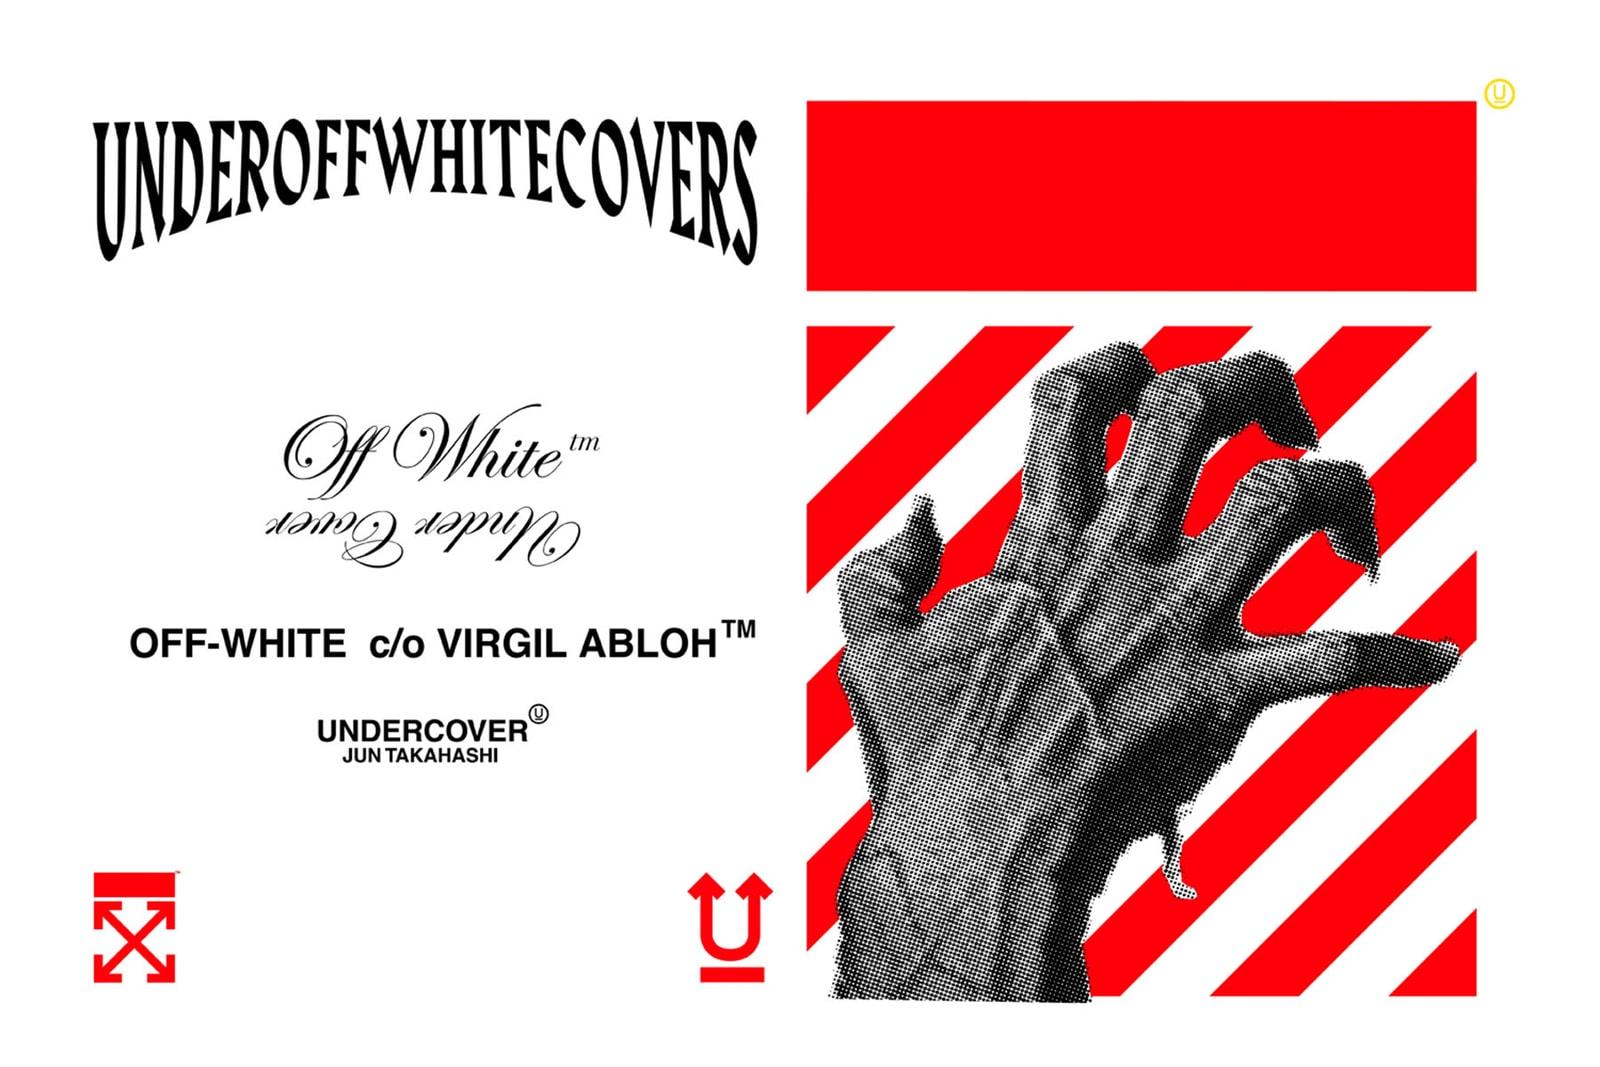 UNDERCOVER JUN TAKAHASHI VIRGIL ABLOH OFF-WHITE OFF WHITE C/O VIRGIL ABLOH UNDERCOVER PRODUCTION NAOTO TAKENAKAD RX ROMANELLI POPUP DARREN ROMANELLI TRUNK(HOTEL) COPIAPOA8 RED BULL JAPAN RED BULL AIR RACE RED BULL AIR RACE CHIBA 2019 BLACKMEANS VINYL RECORDS RECORDING INDUSTRY ASSOCIATION OF AMERICA CDS VINYL